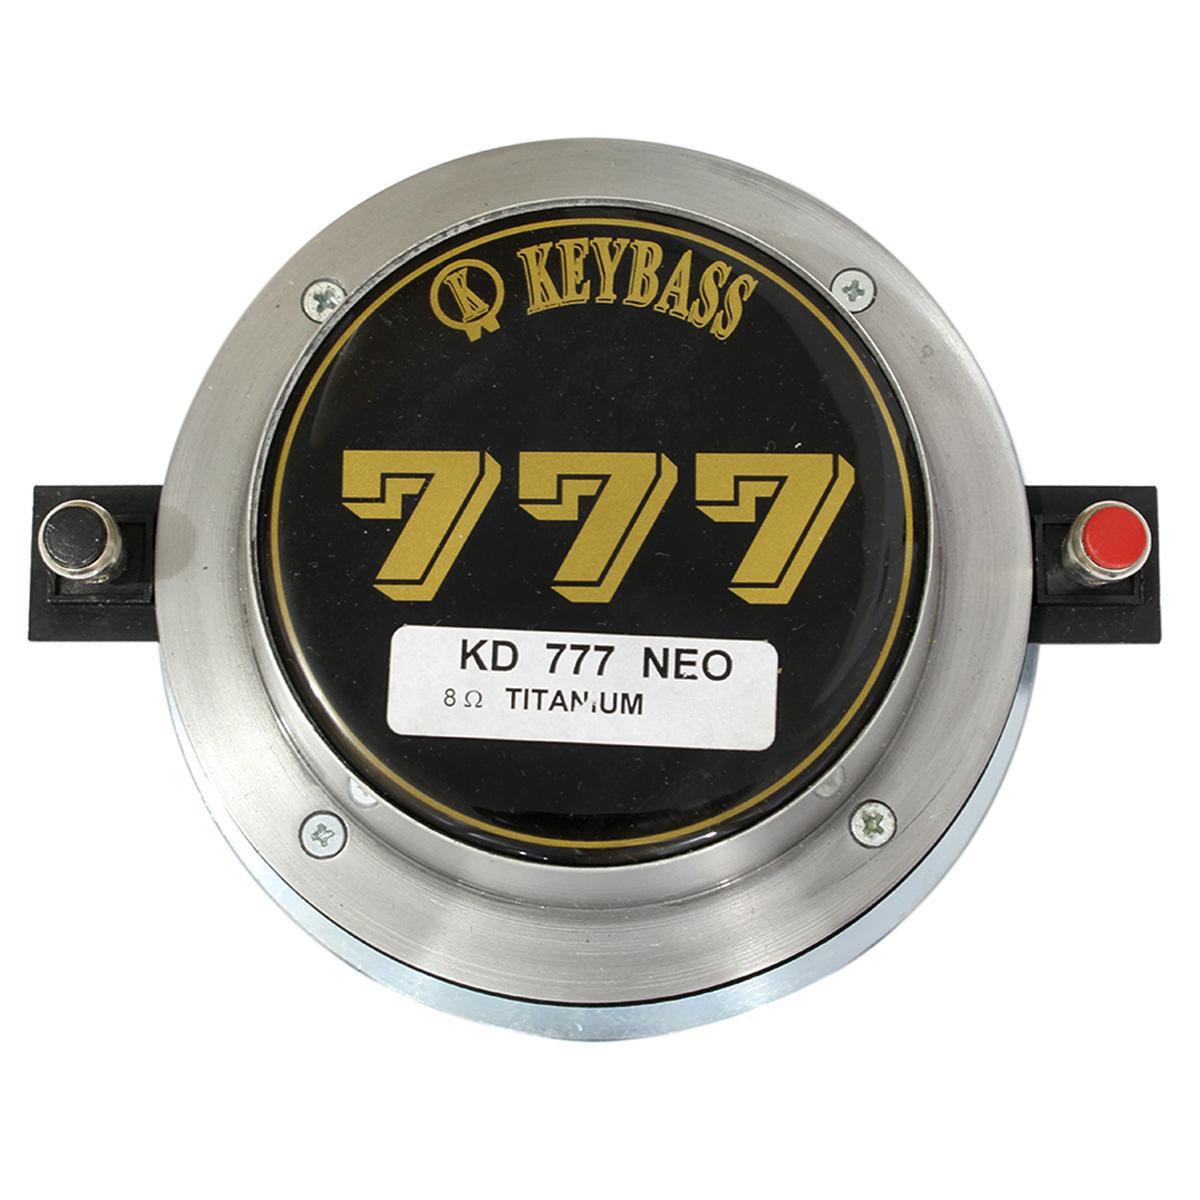 Driver Mid High Titanio 85w Rms 8 Ohms | Keybass | KD777NEO